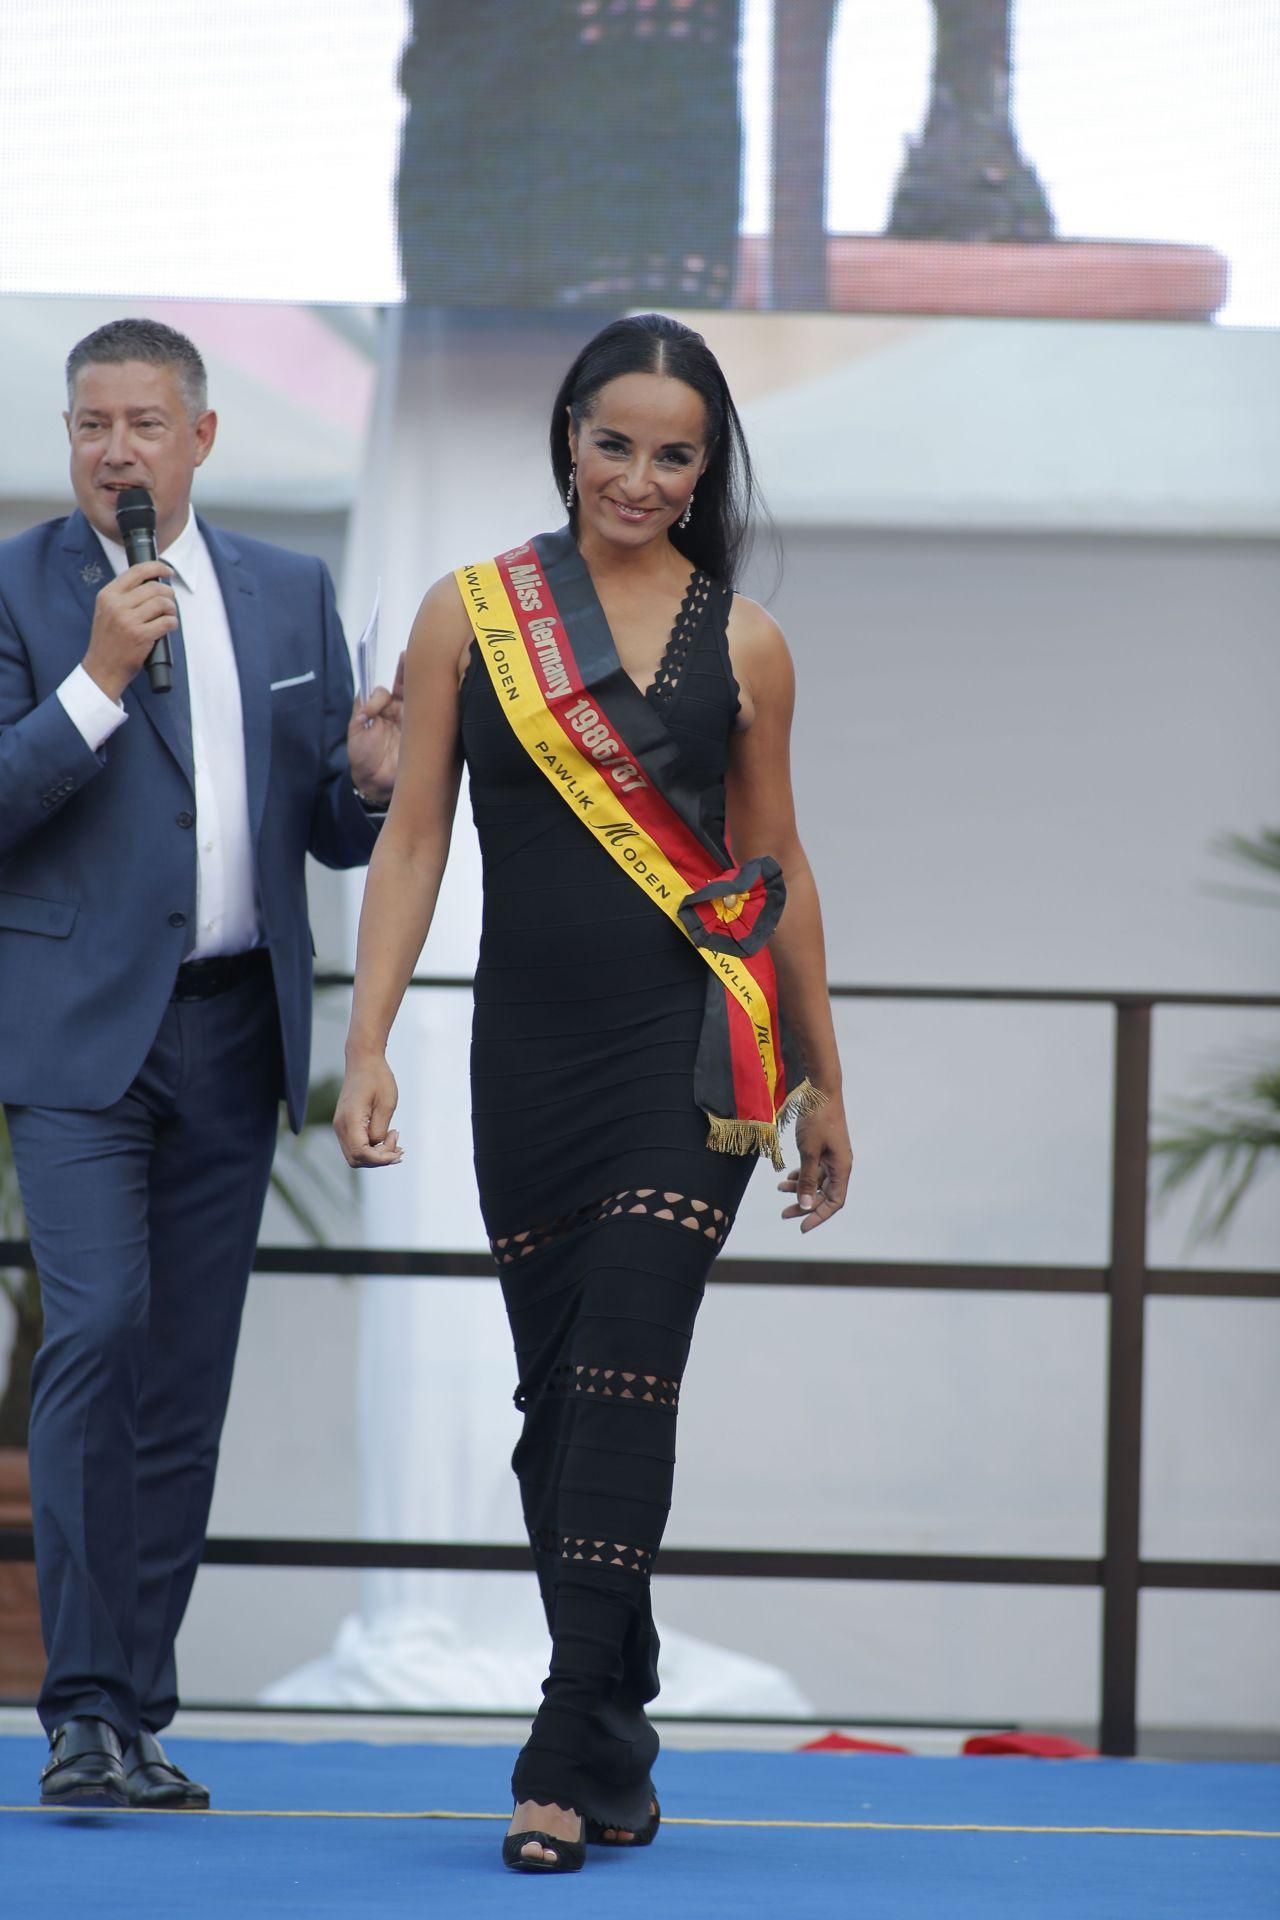 Manuela ThomaAdofo  European Miss Team Cup in EuropaPark Rust 07062017